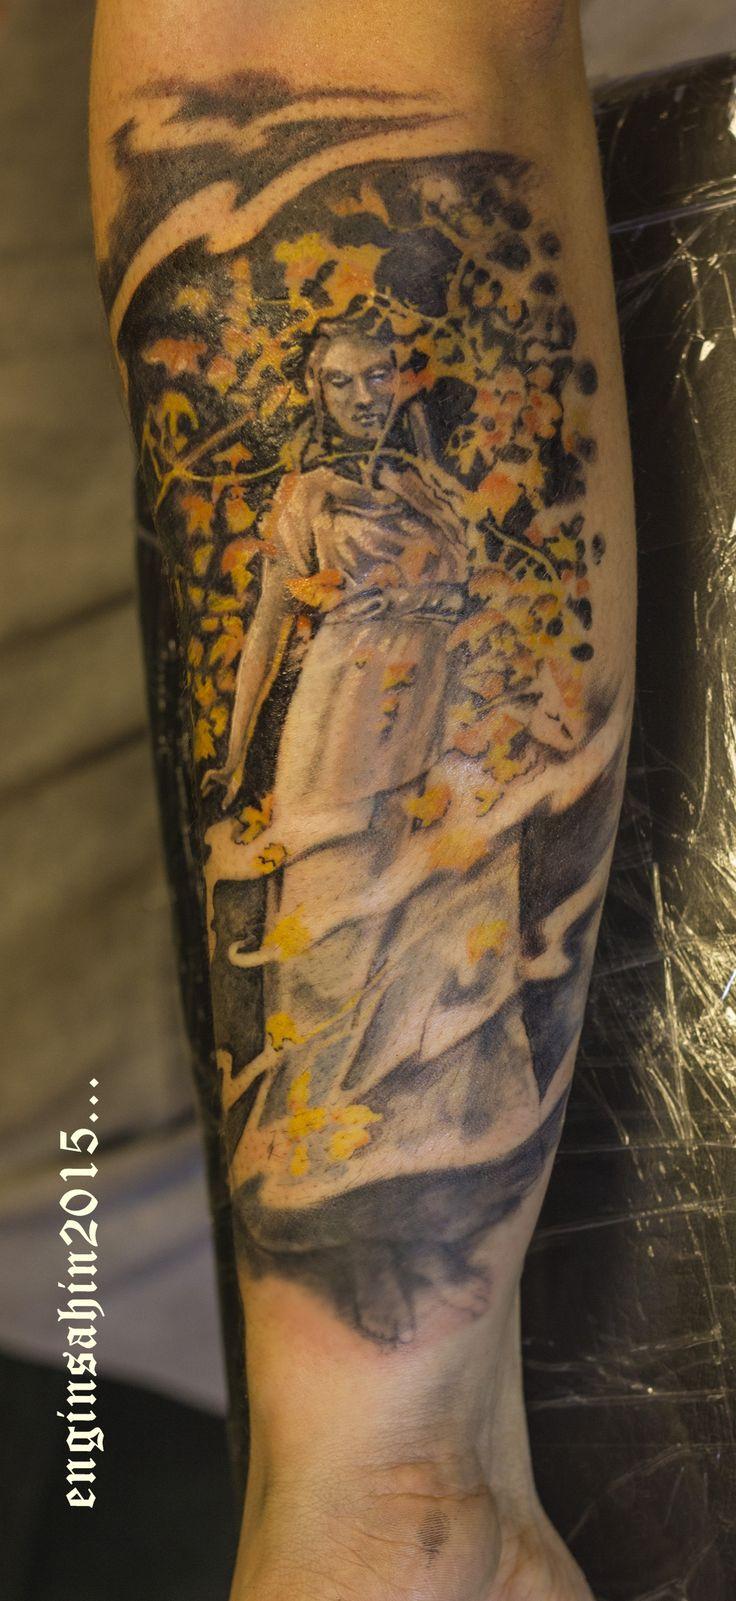 engin şahin - tattoo - dövme - angel - statue - realistic - melek dövmesi